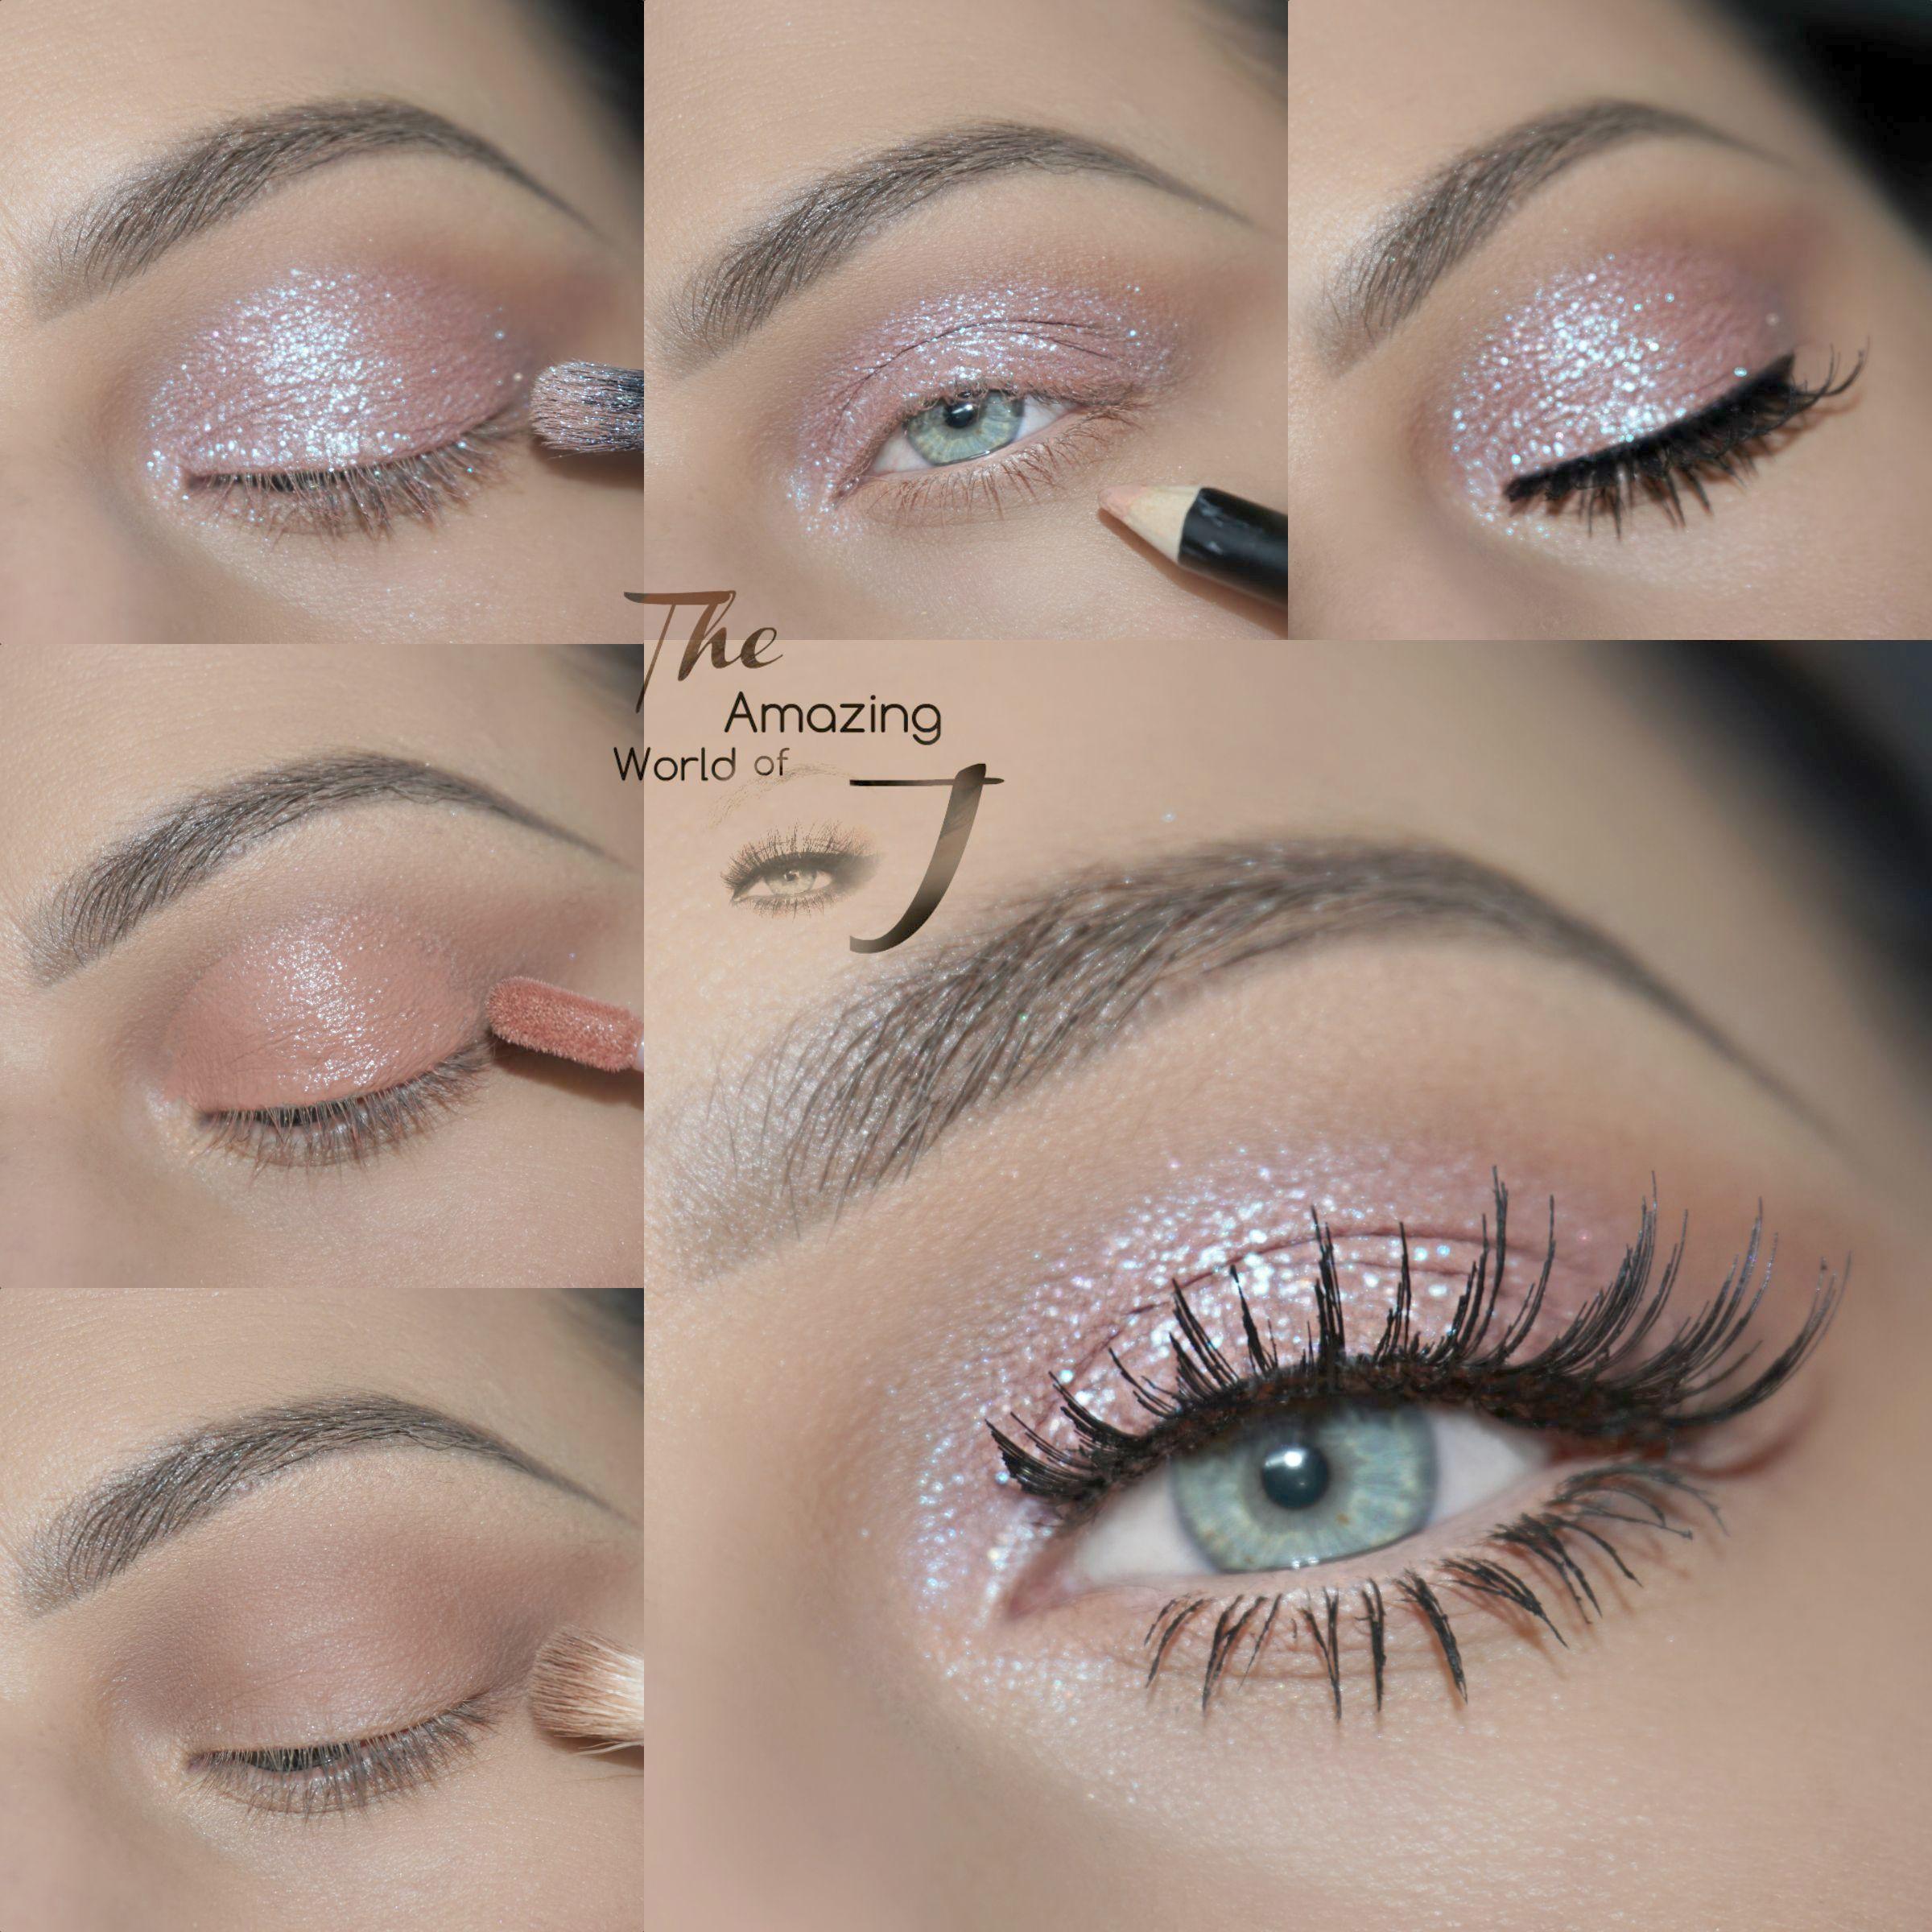 Glitter Eyeshadow Liquid after Glitter Eyeshadow Red